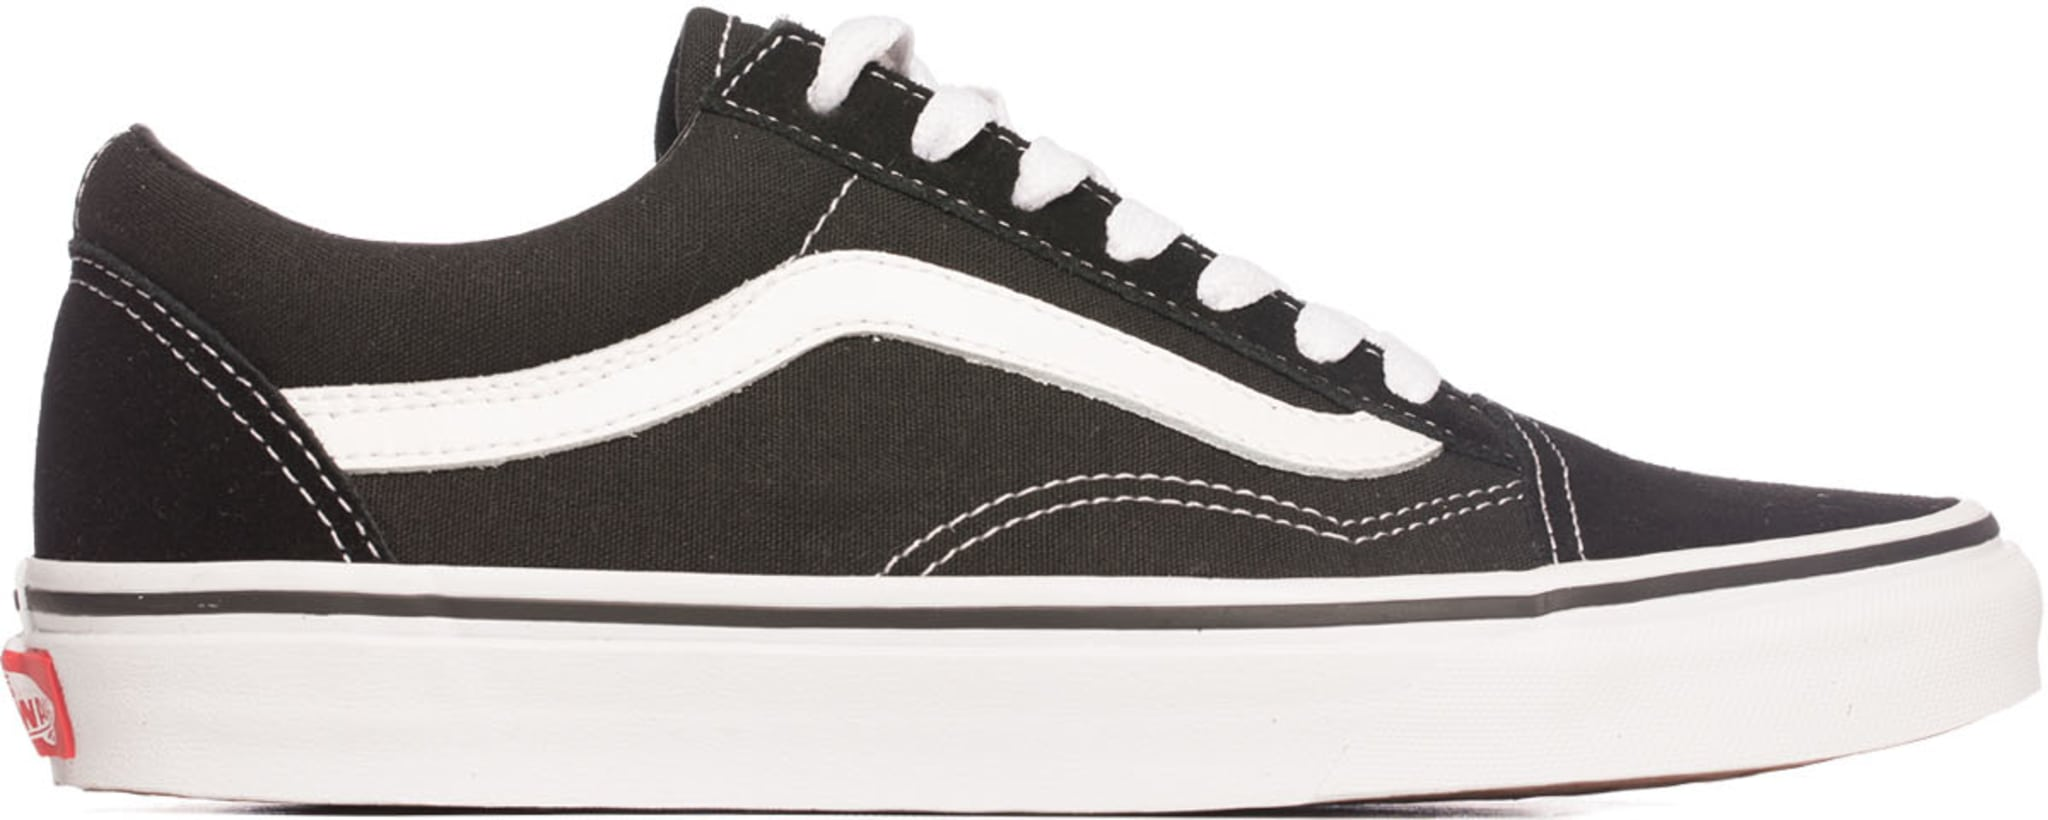 Vans  Old Skool - Black White  457d066258